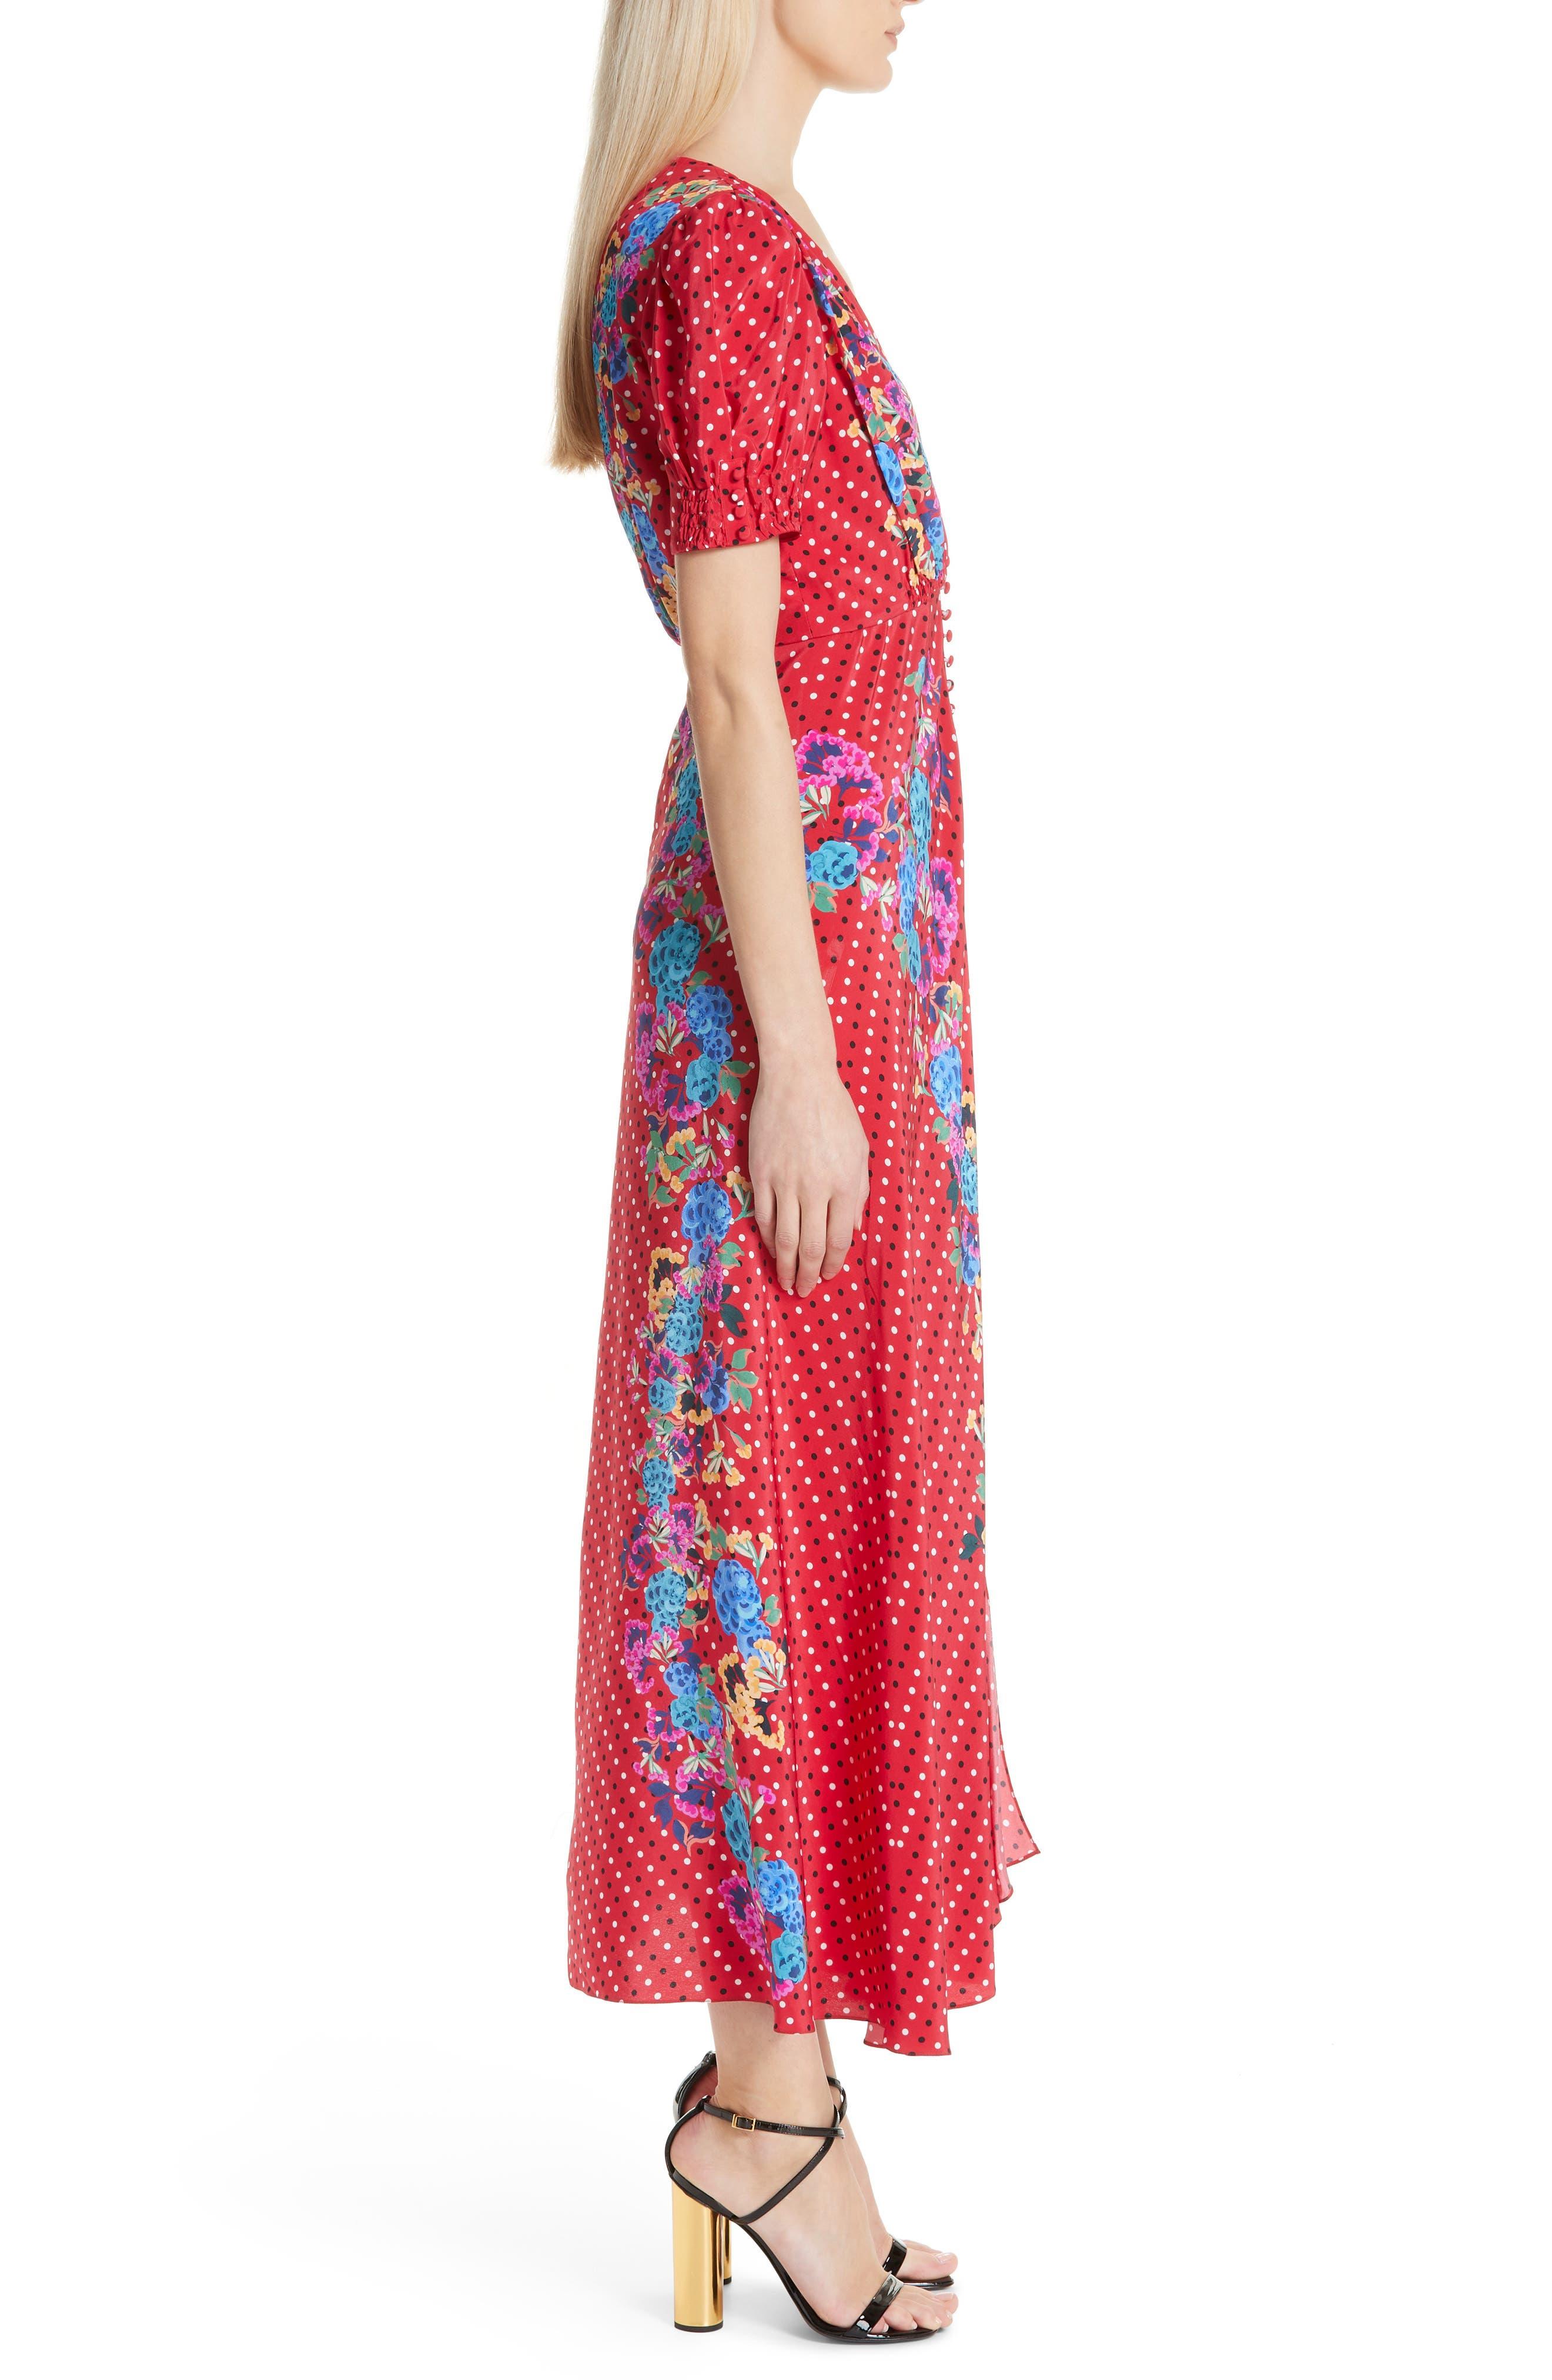 SALONI, Lea Print Silk Maxi Dress, Alternate thumbnail 3, color, SCARLET POLKA DOT